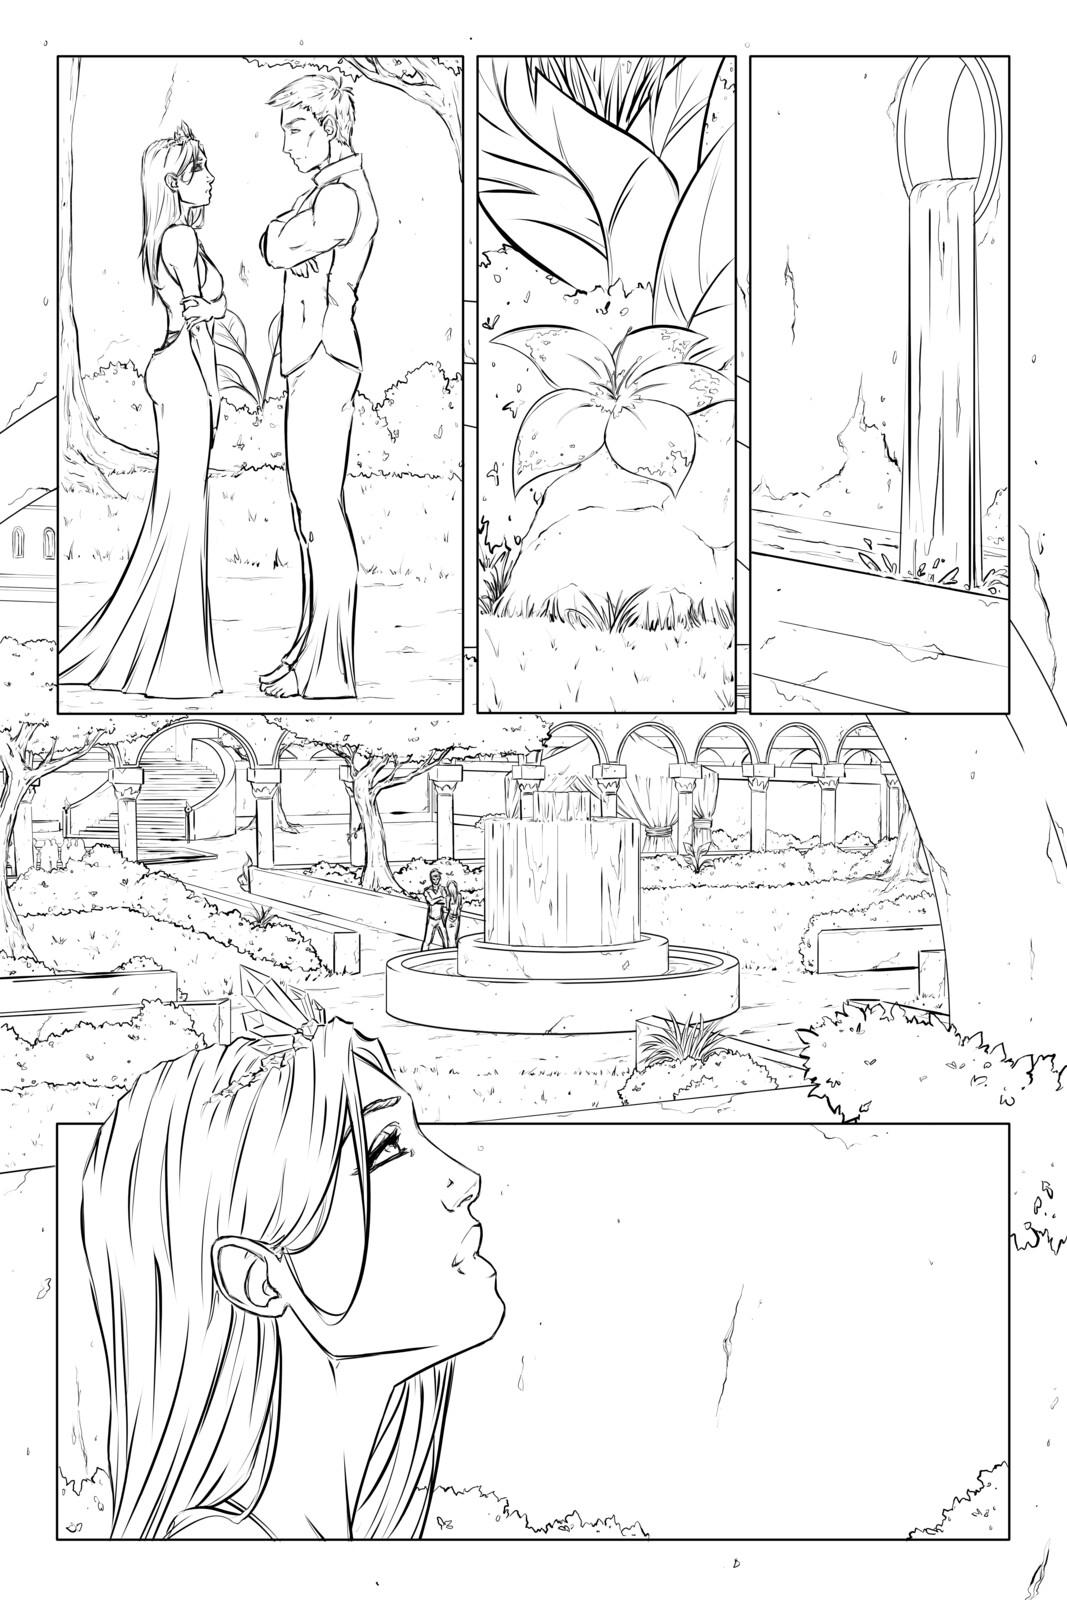 Page 15 - Line art